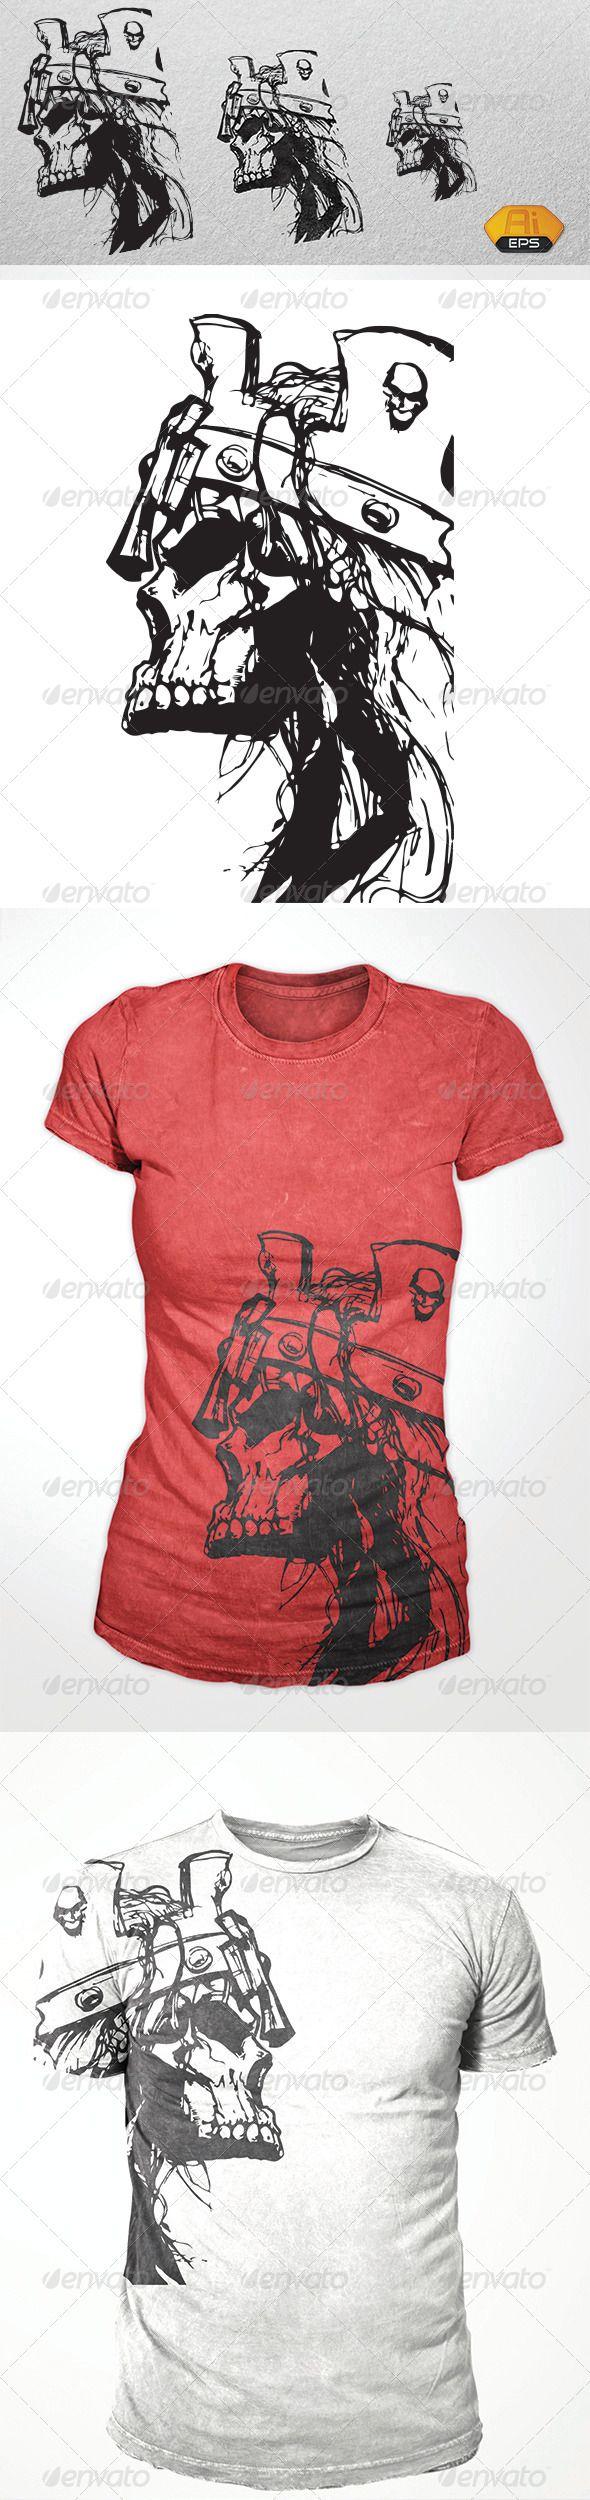 Shirt design jquery - Realistic Graphic Download Ai Psd Http Jquerygraphic Prints Design